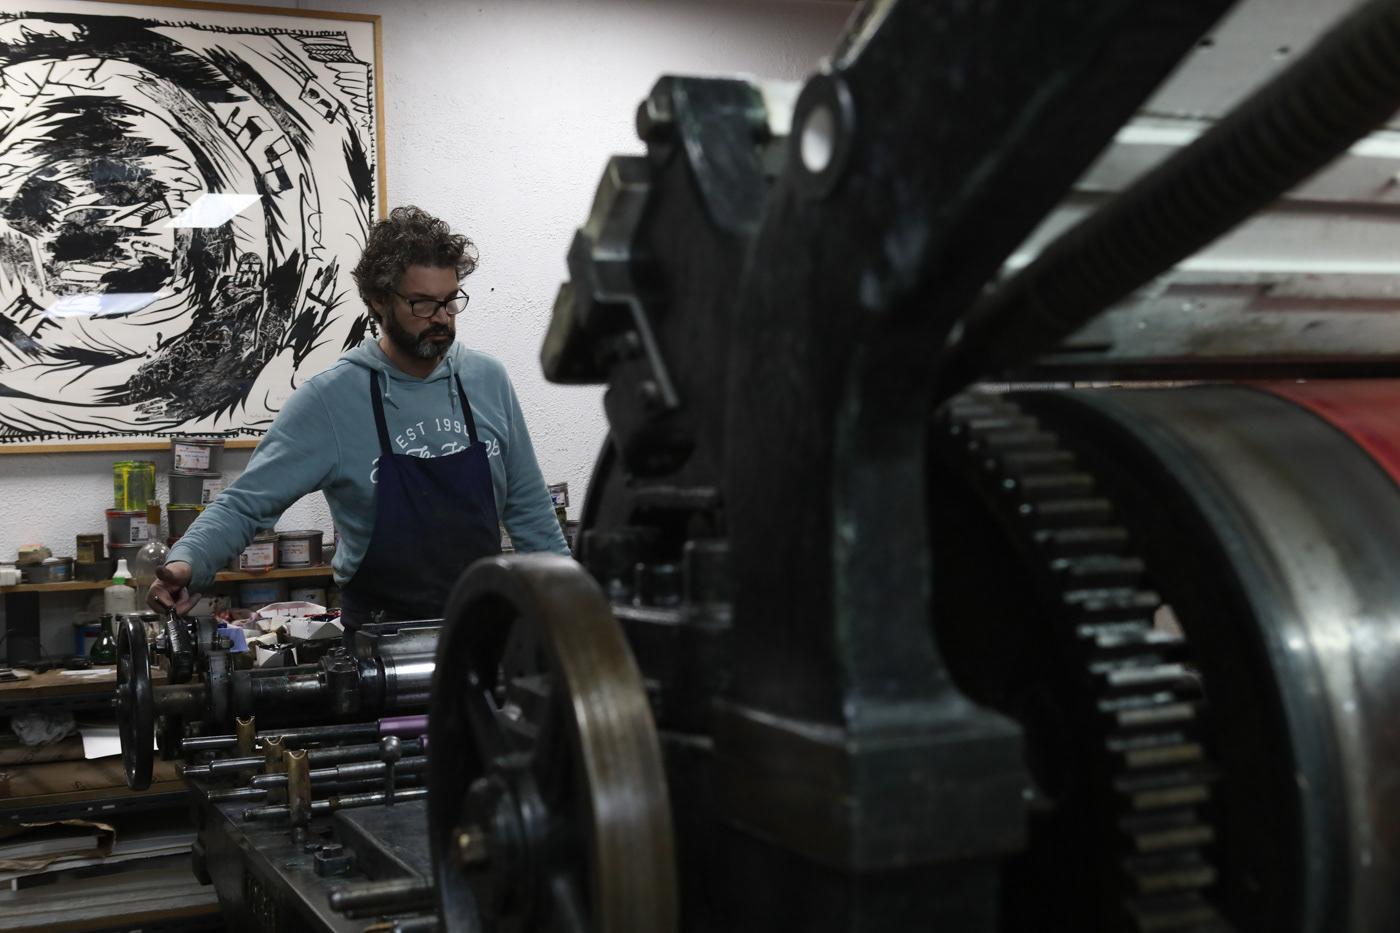 typographer portrait artisan Work  Paris Printing art Photography